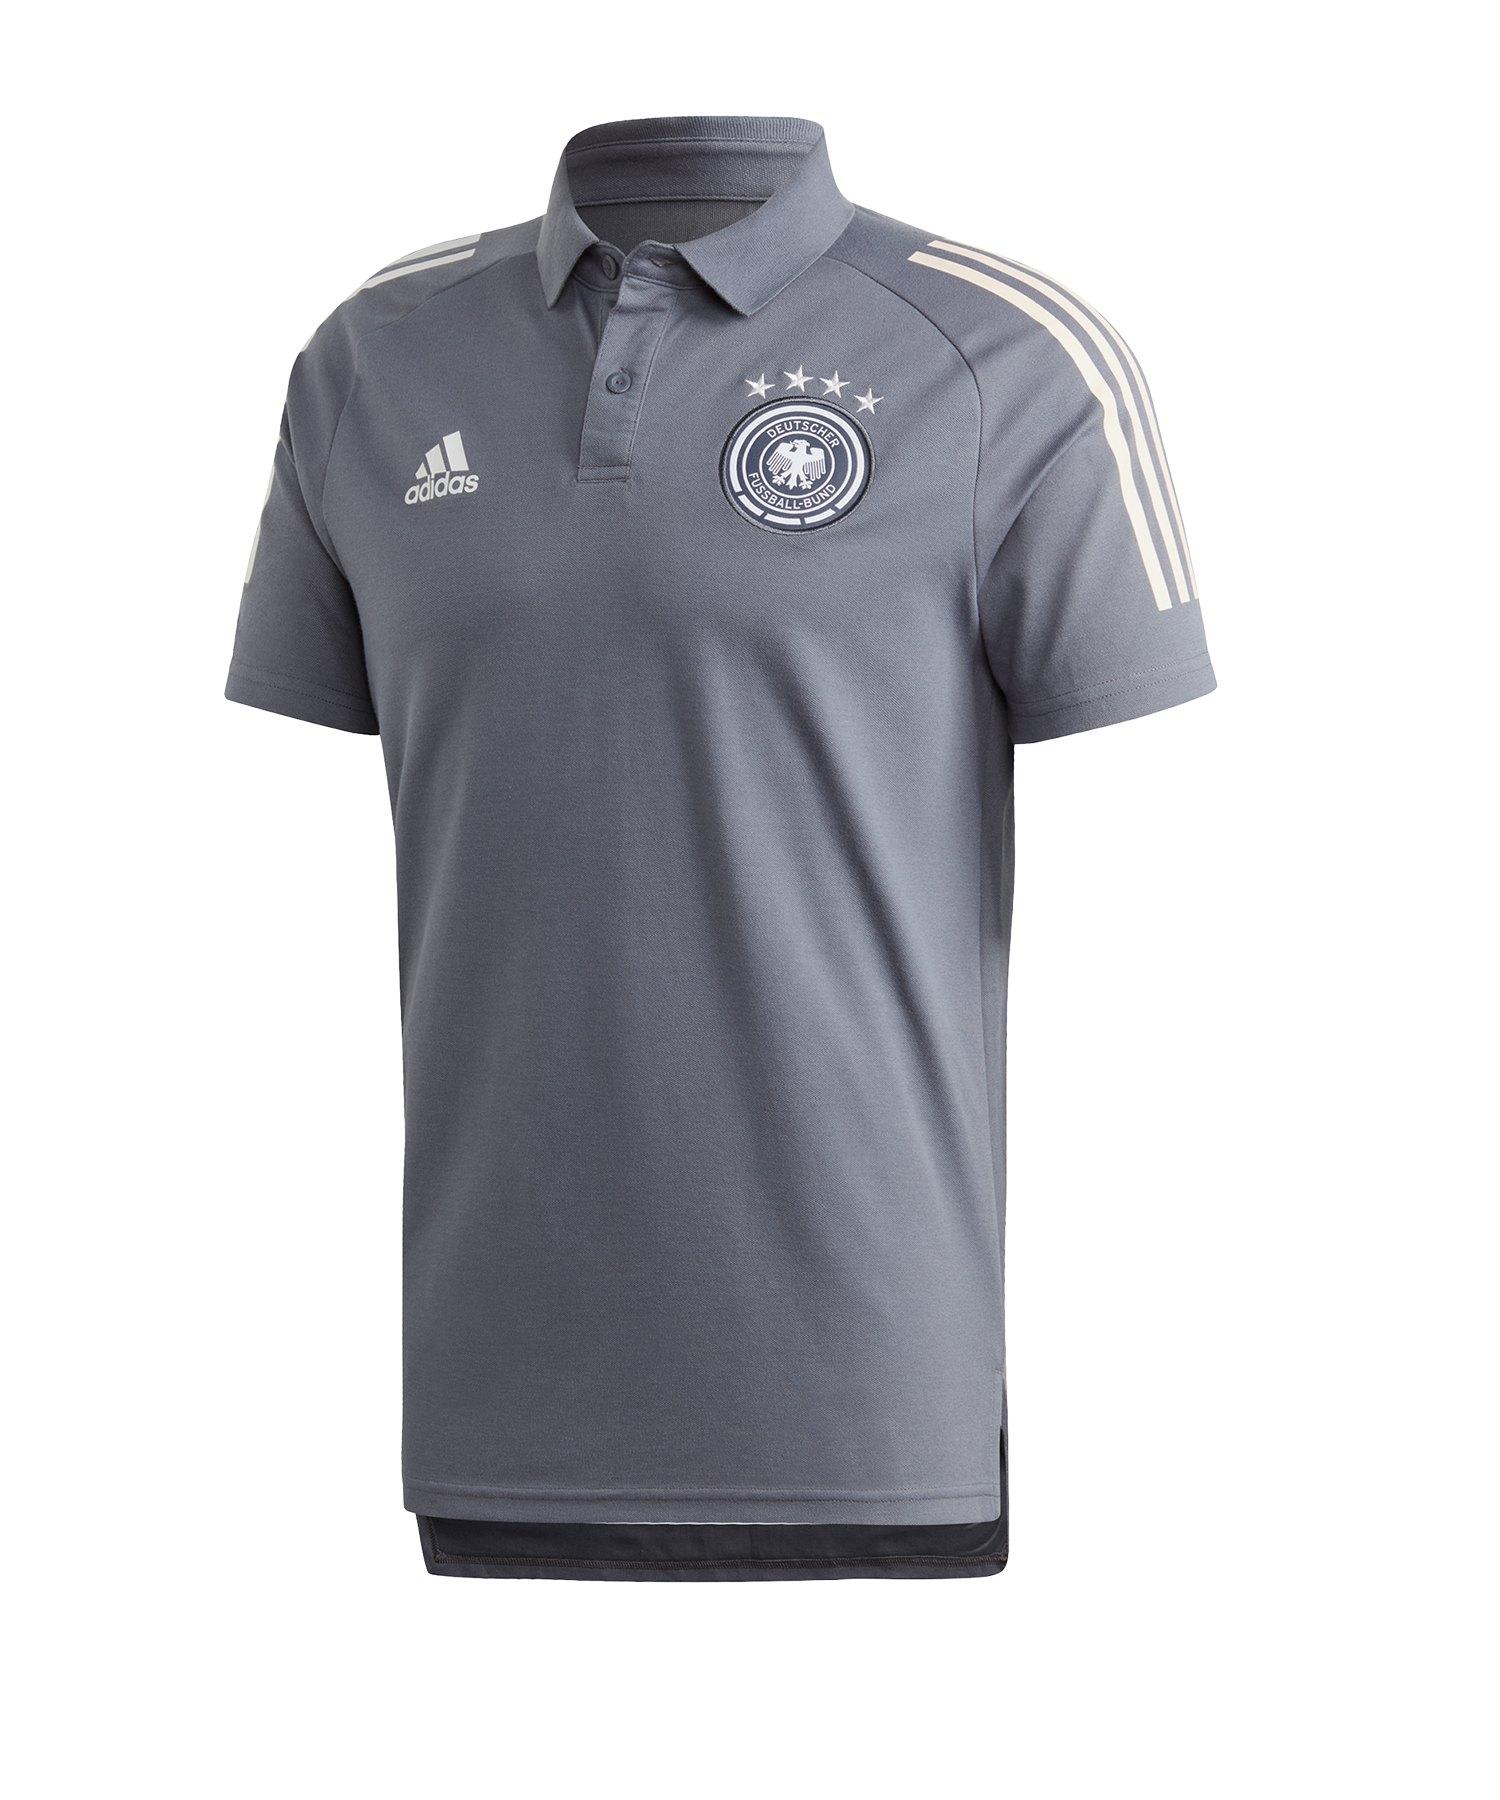 adidas DFB Deutschland Poloshirt Grau - grau